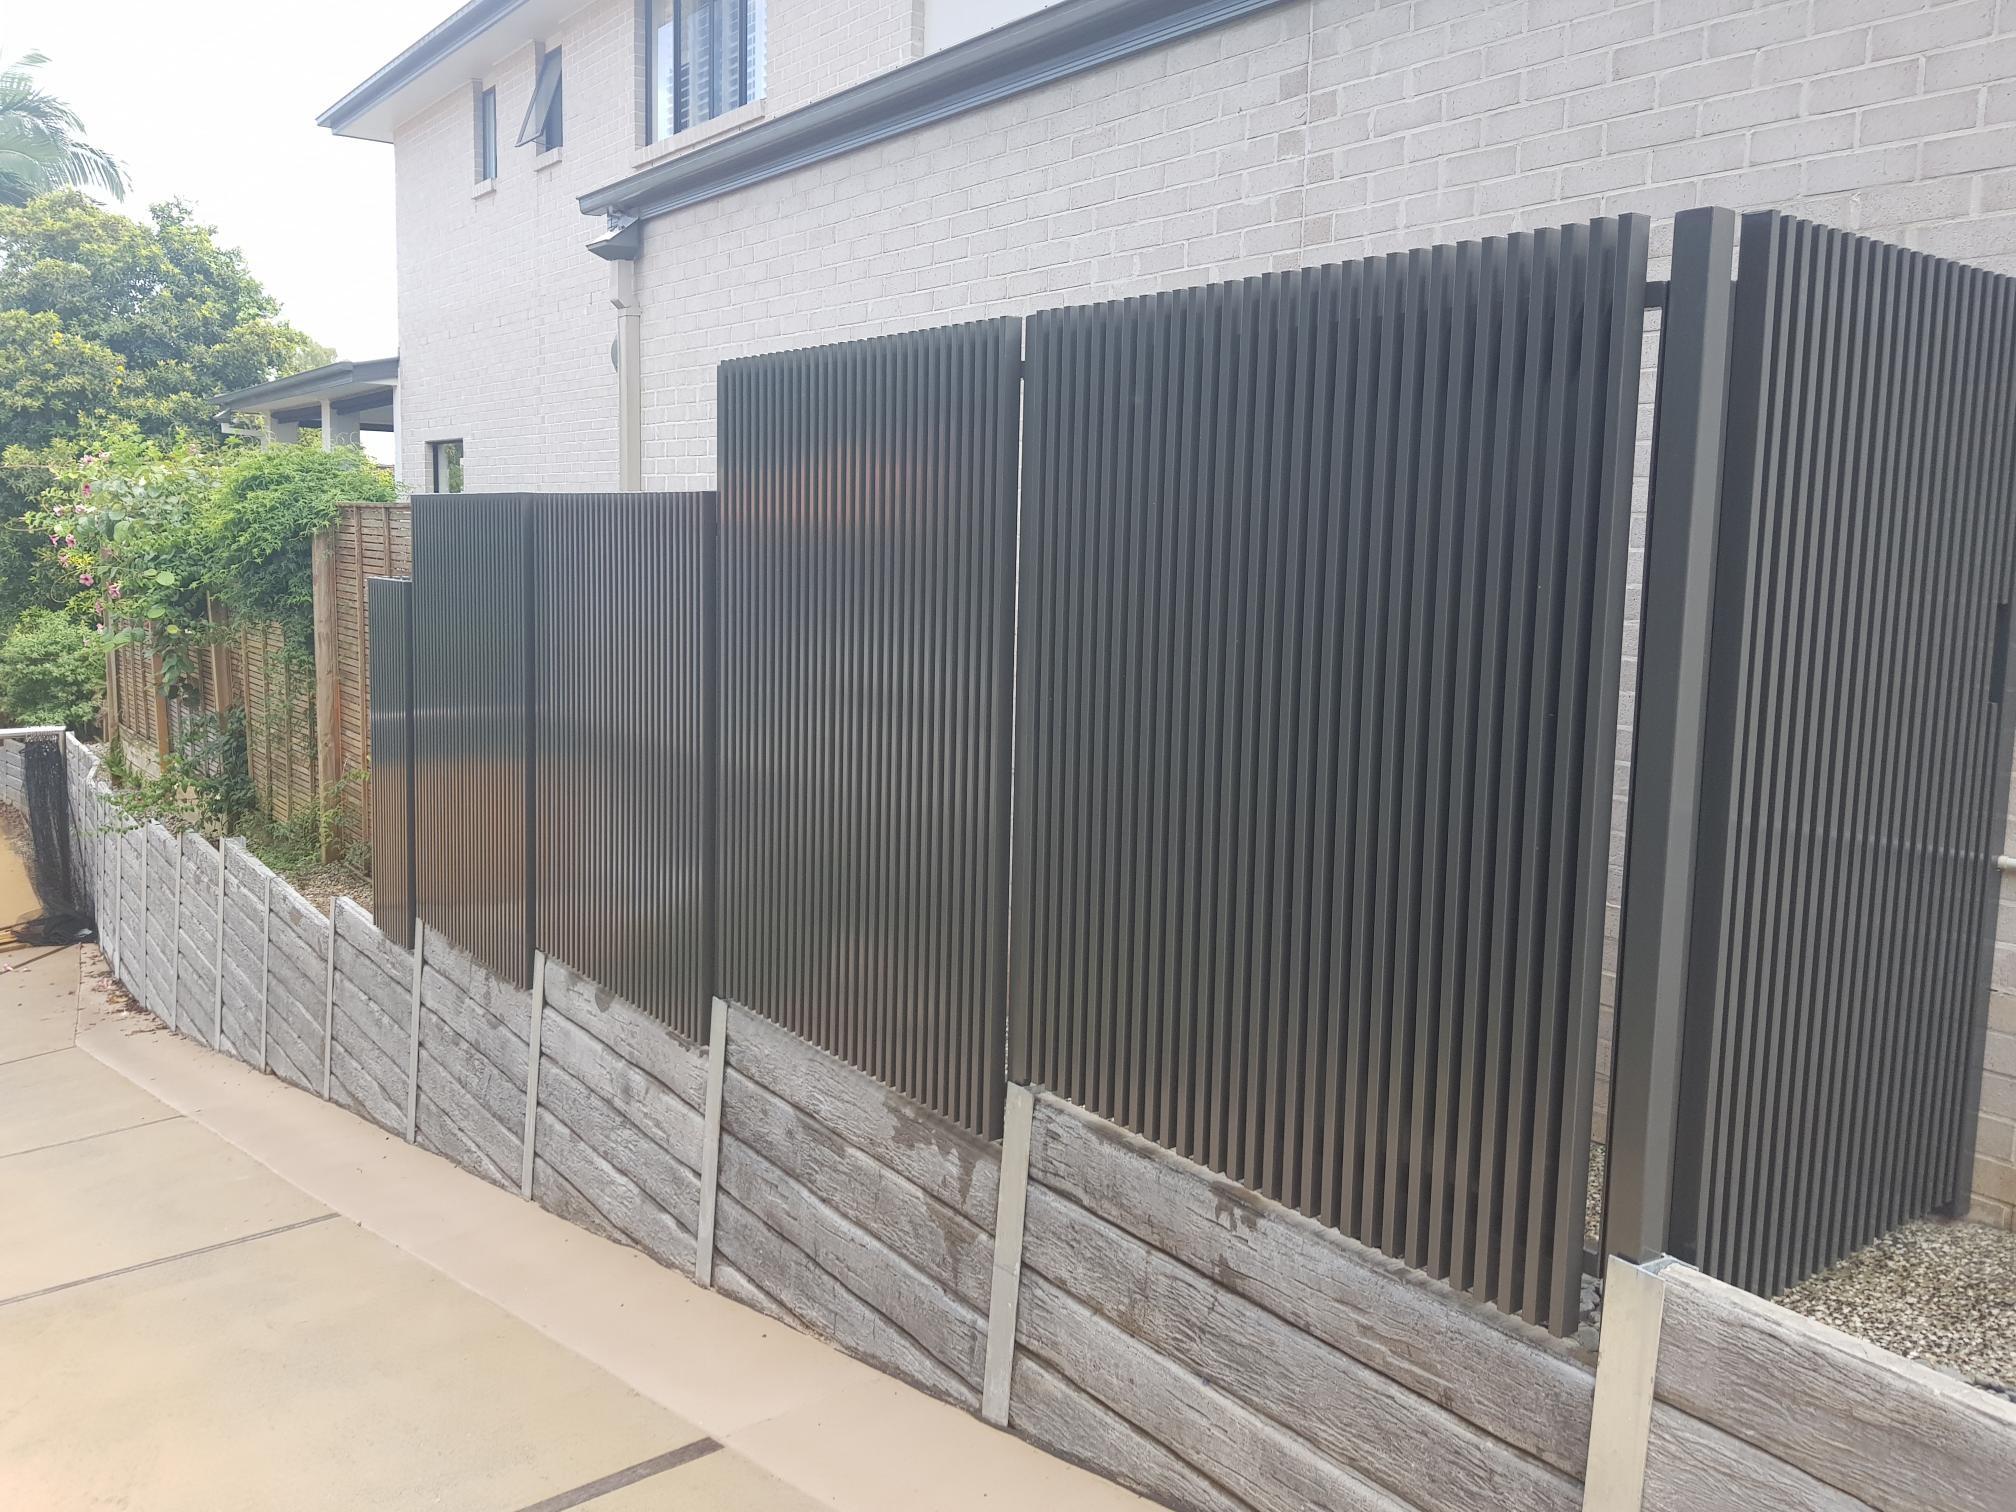 Aluminium Fencing 9 - www.thefabcompany.com.au